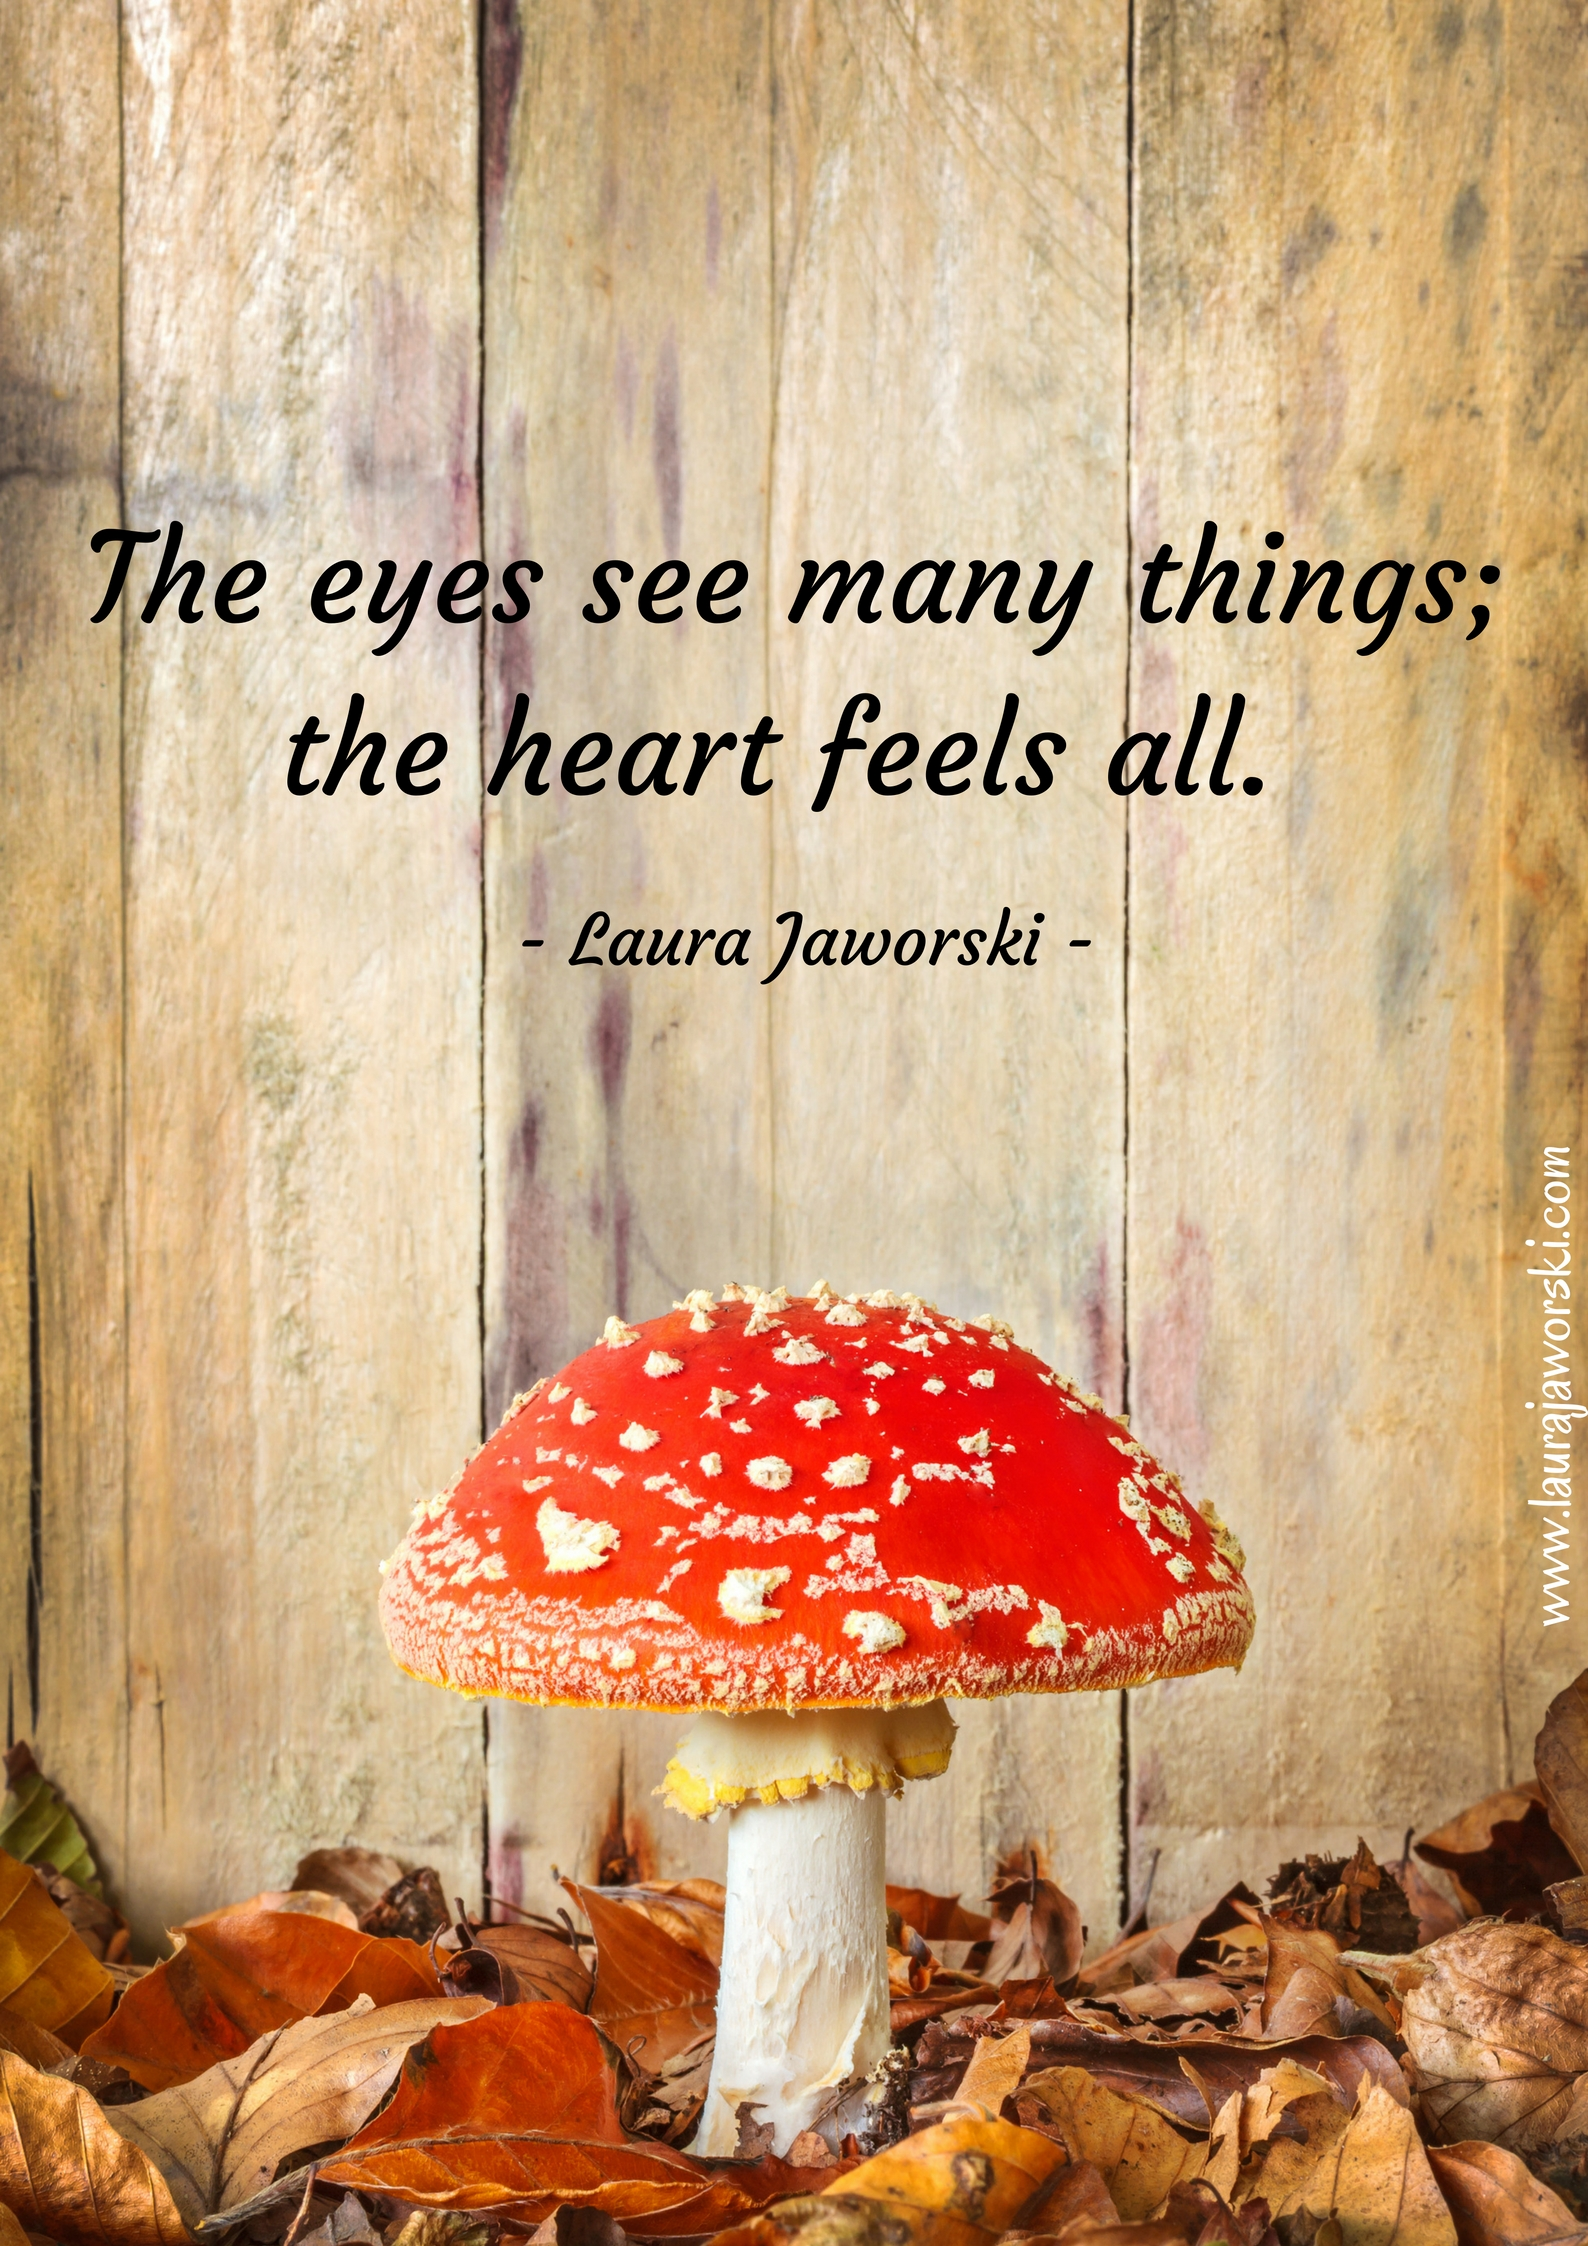 The Heart | www.laurajaworski.com